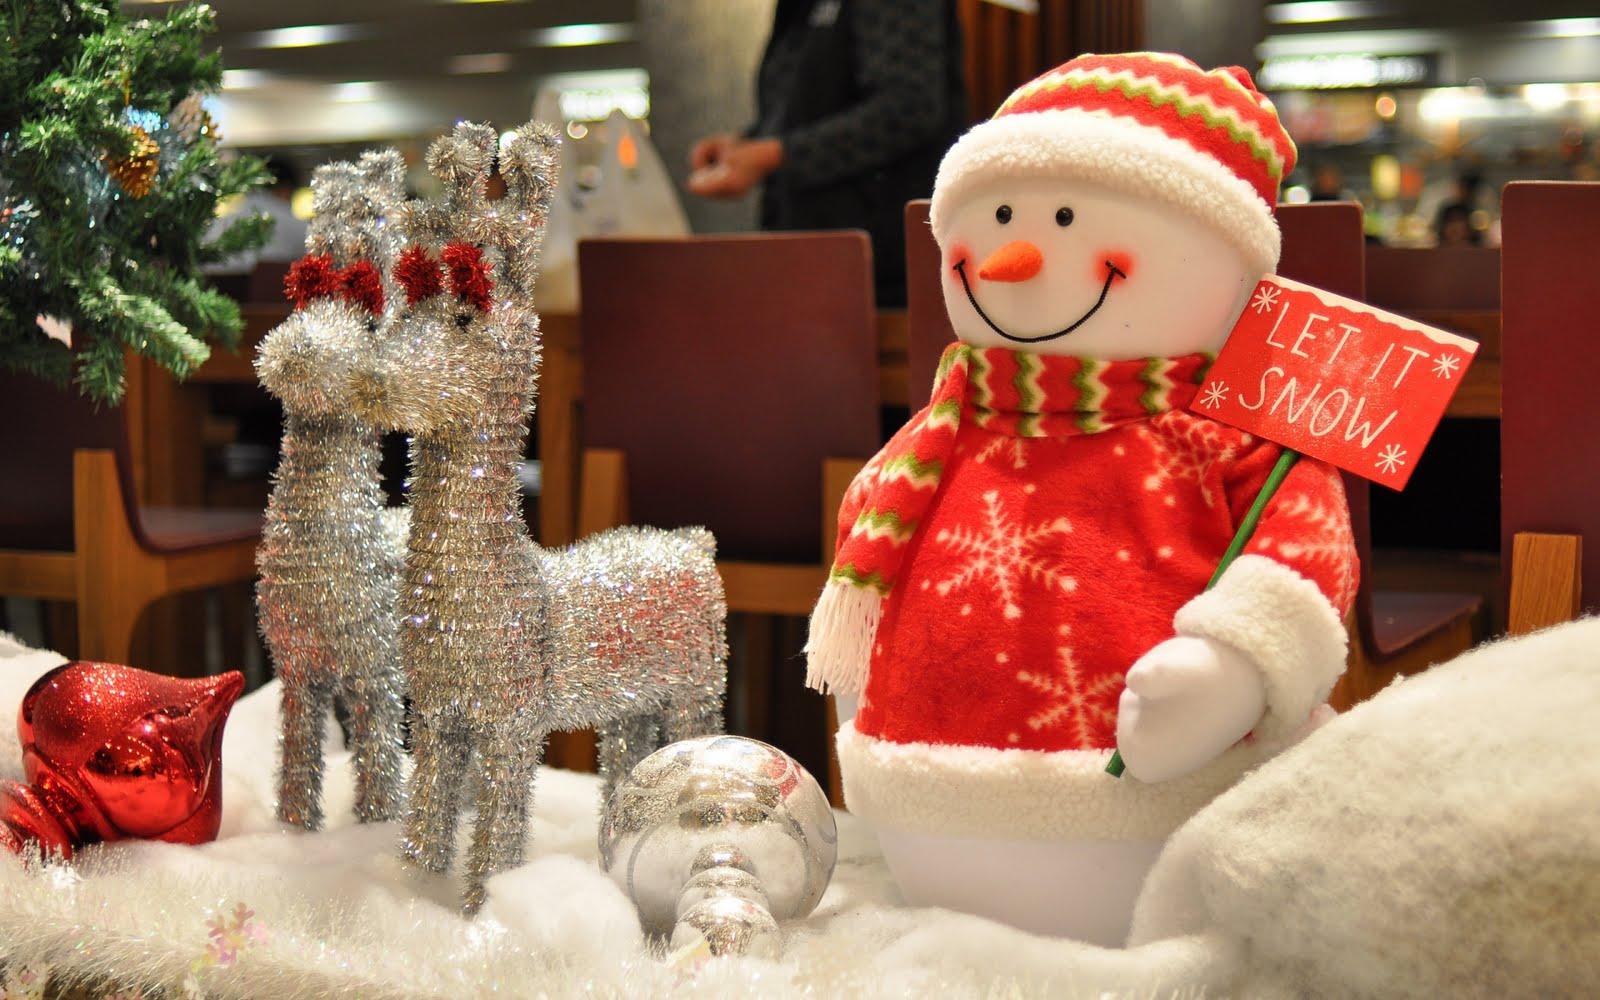 Peluche de muñeco de nieve - 1600x1000